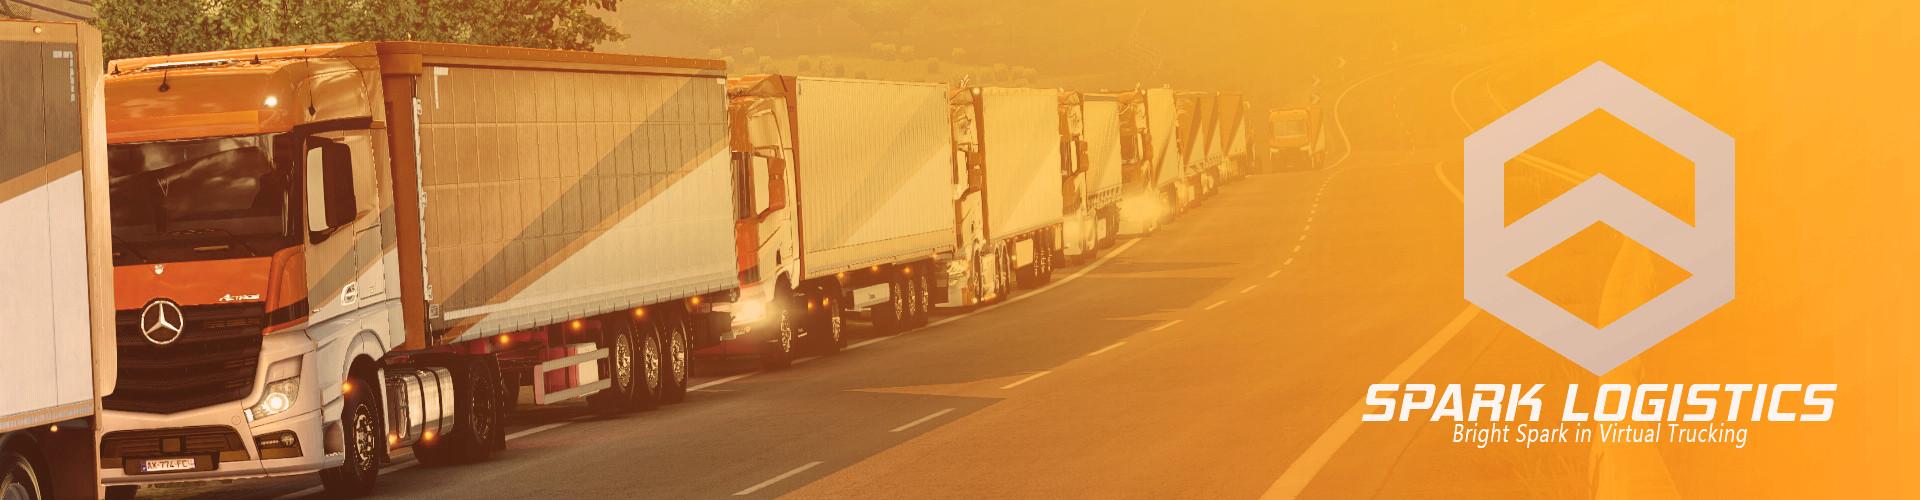 Spark Logistics Monthly Convoy